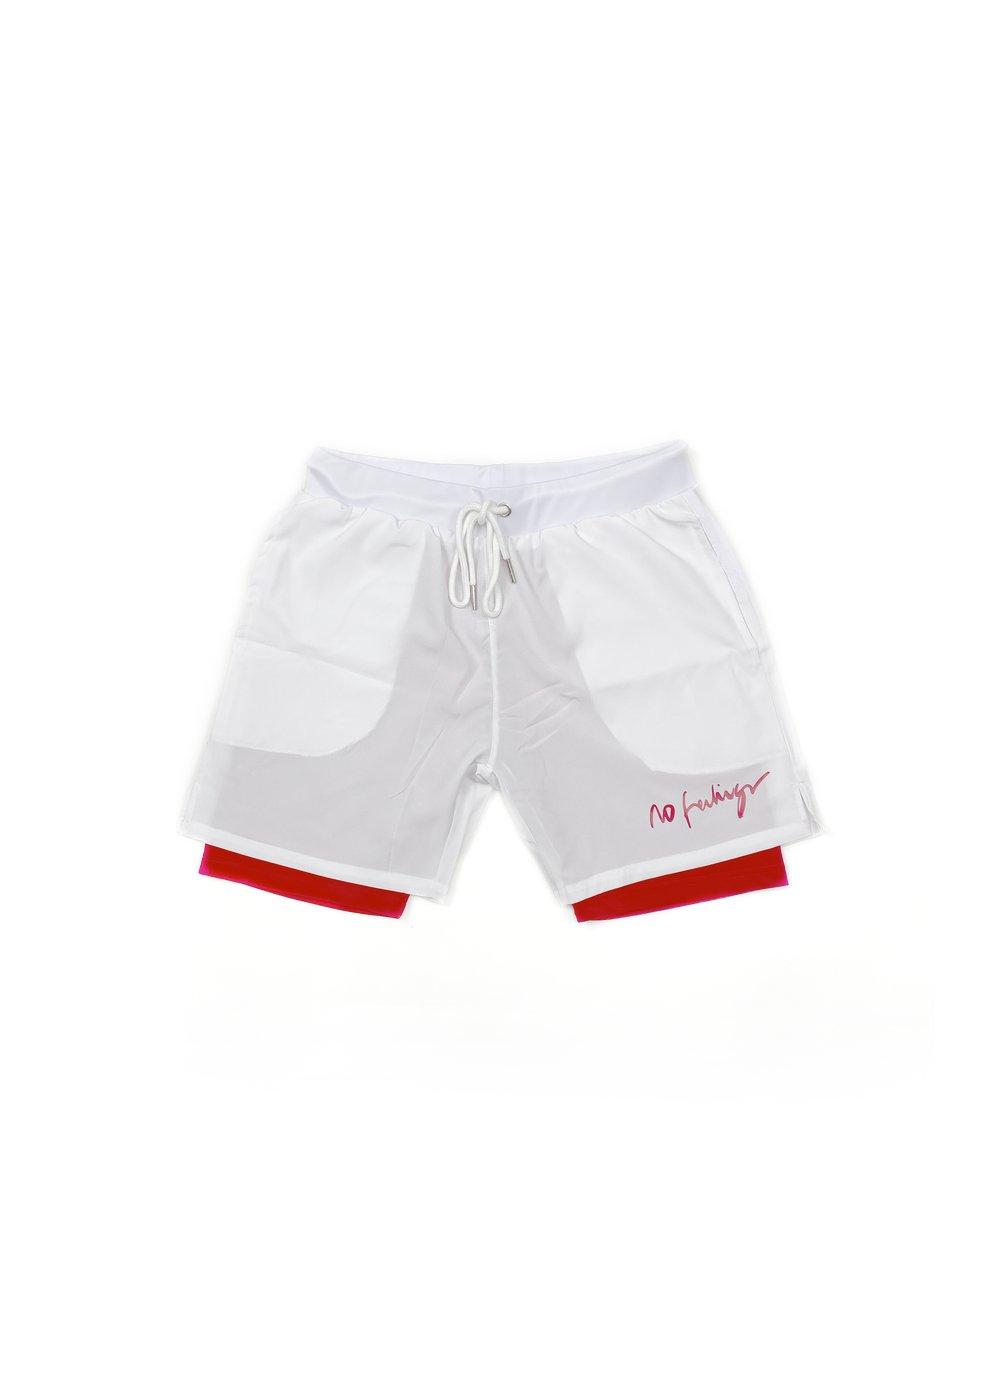 No Feelings Running Club Shorts